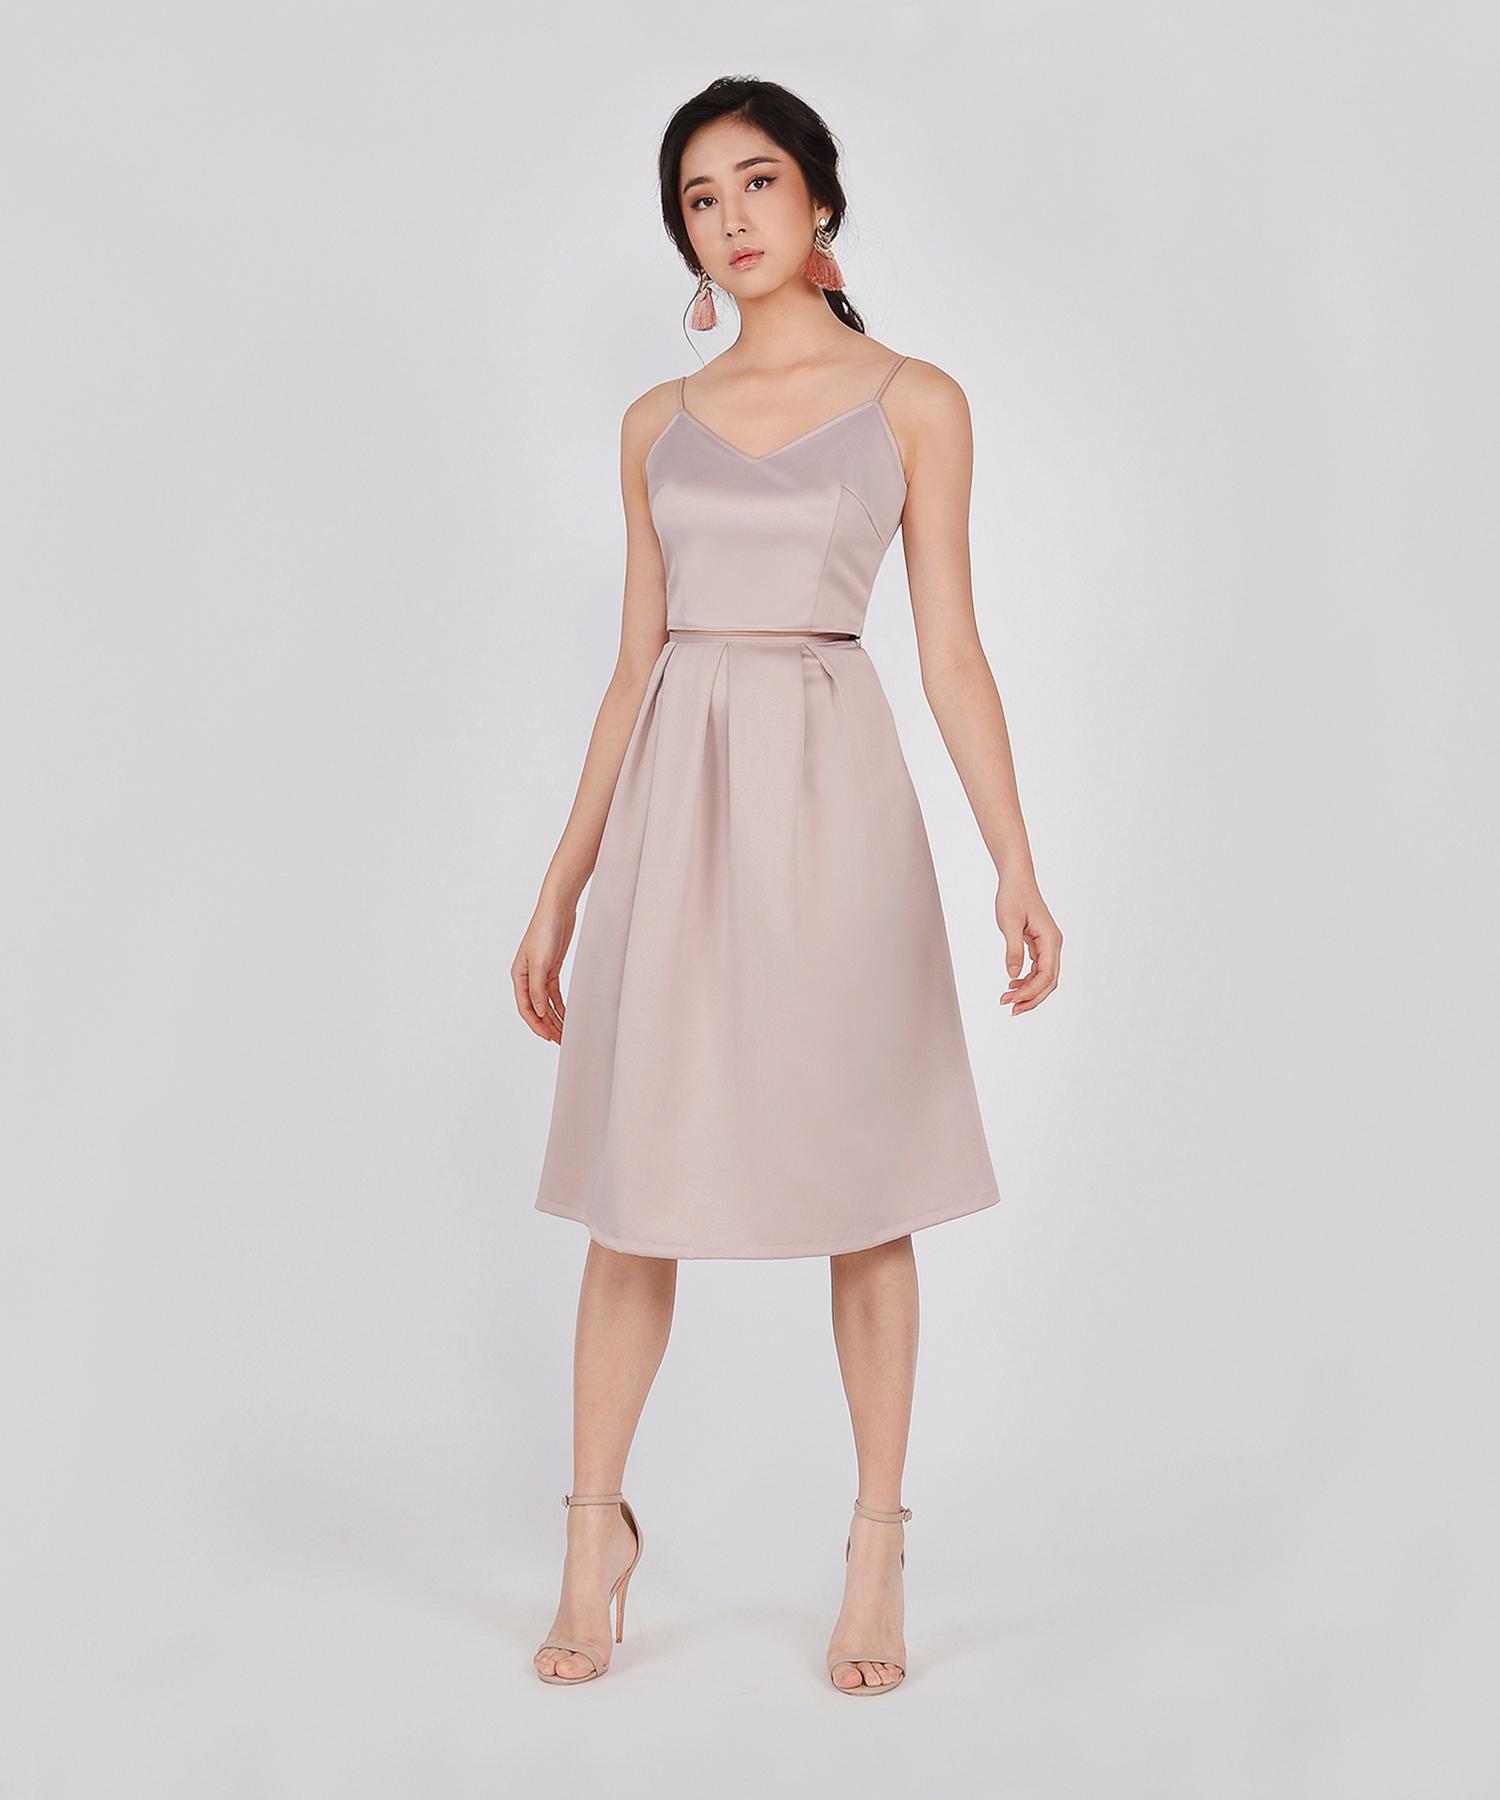 93f3d0fd8e HVV Atelier Ella Structured Midi Skirt - Champagne | hervelvetvase